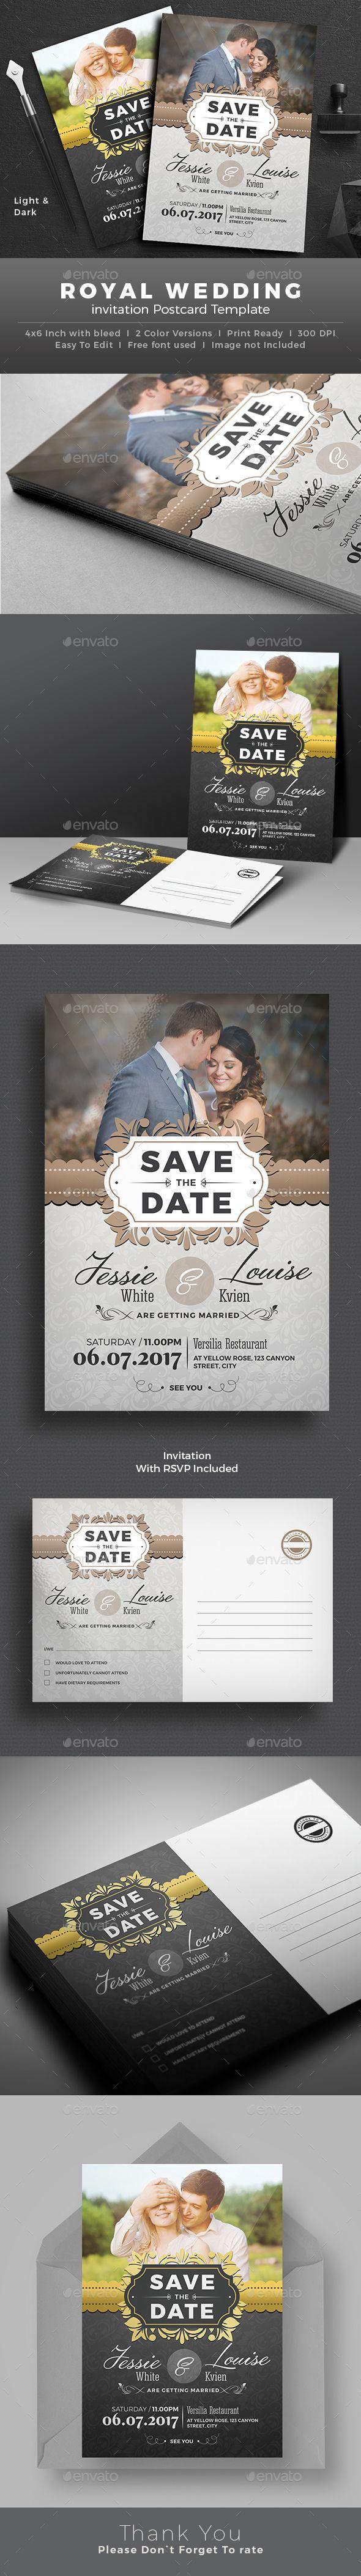 Wedding Invitation Card Design Template - Weddings Cards & Invite Template PSD. Download here: http://graphicriver.net/item/wedding-invitation/16894013?s_rank=20&ref=yinkira